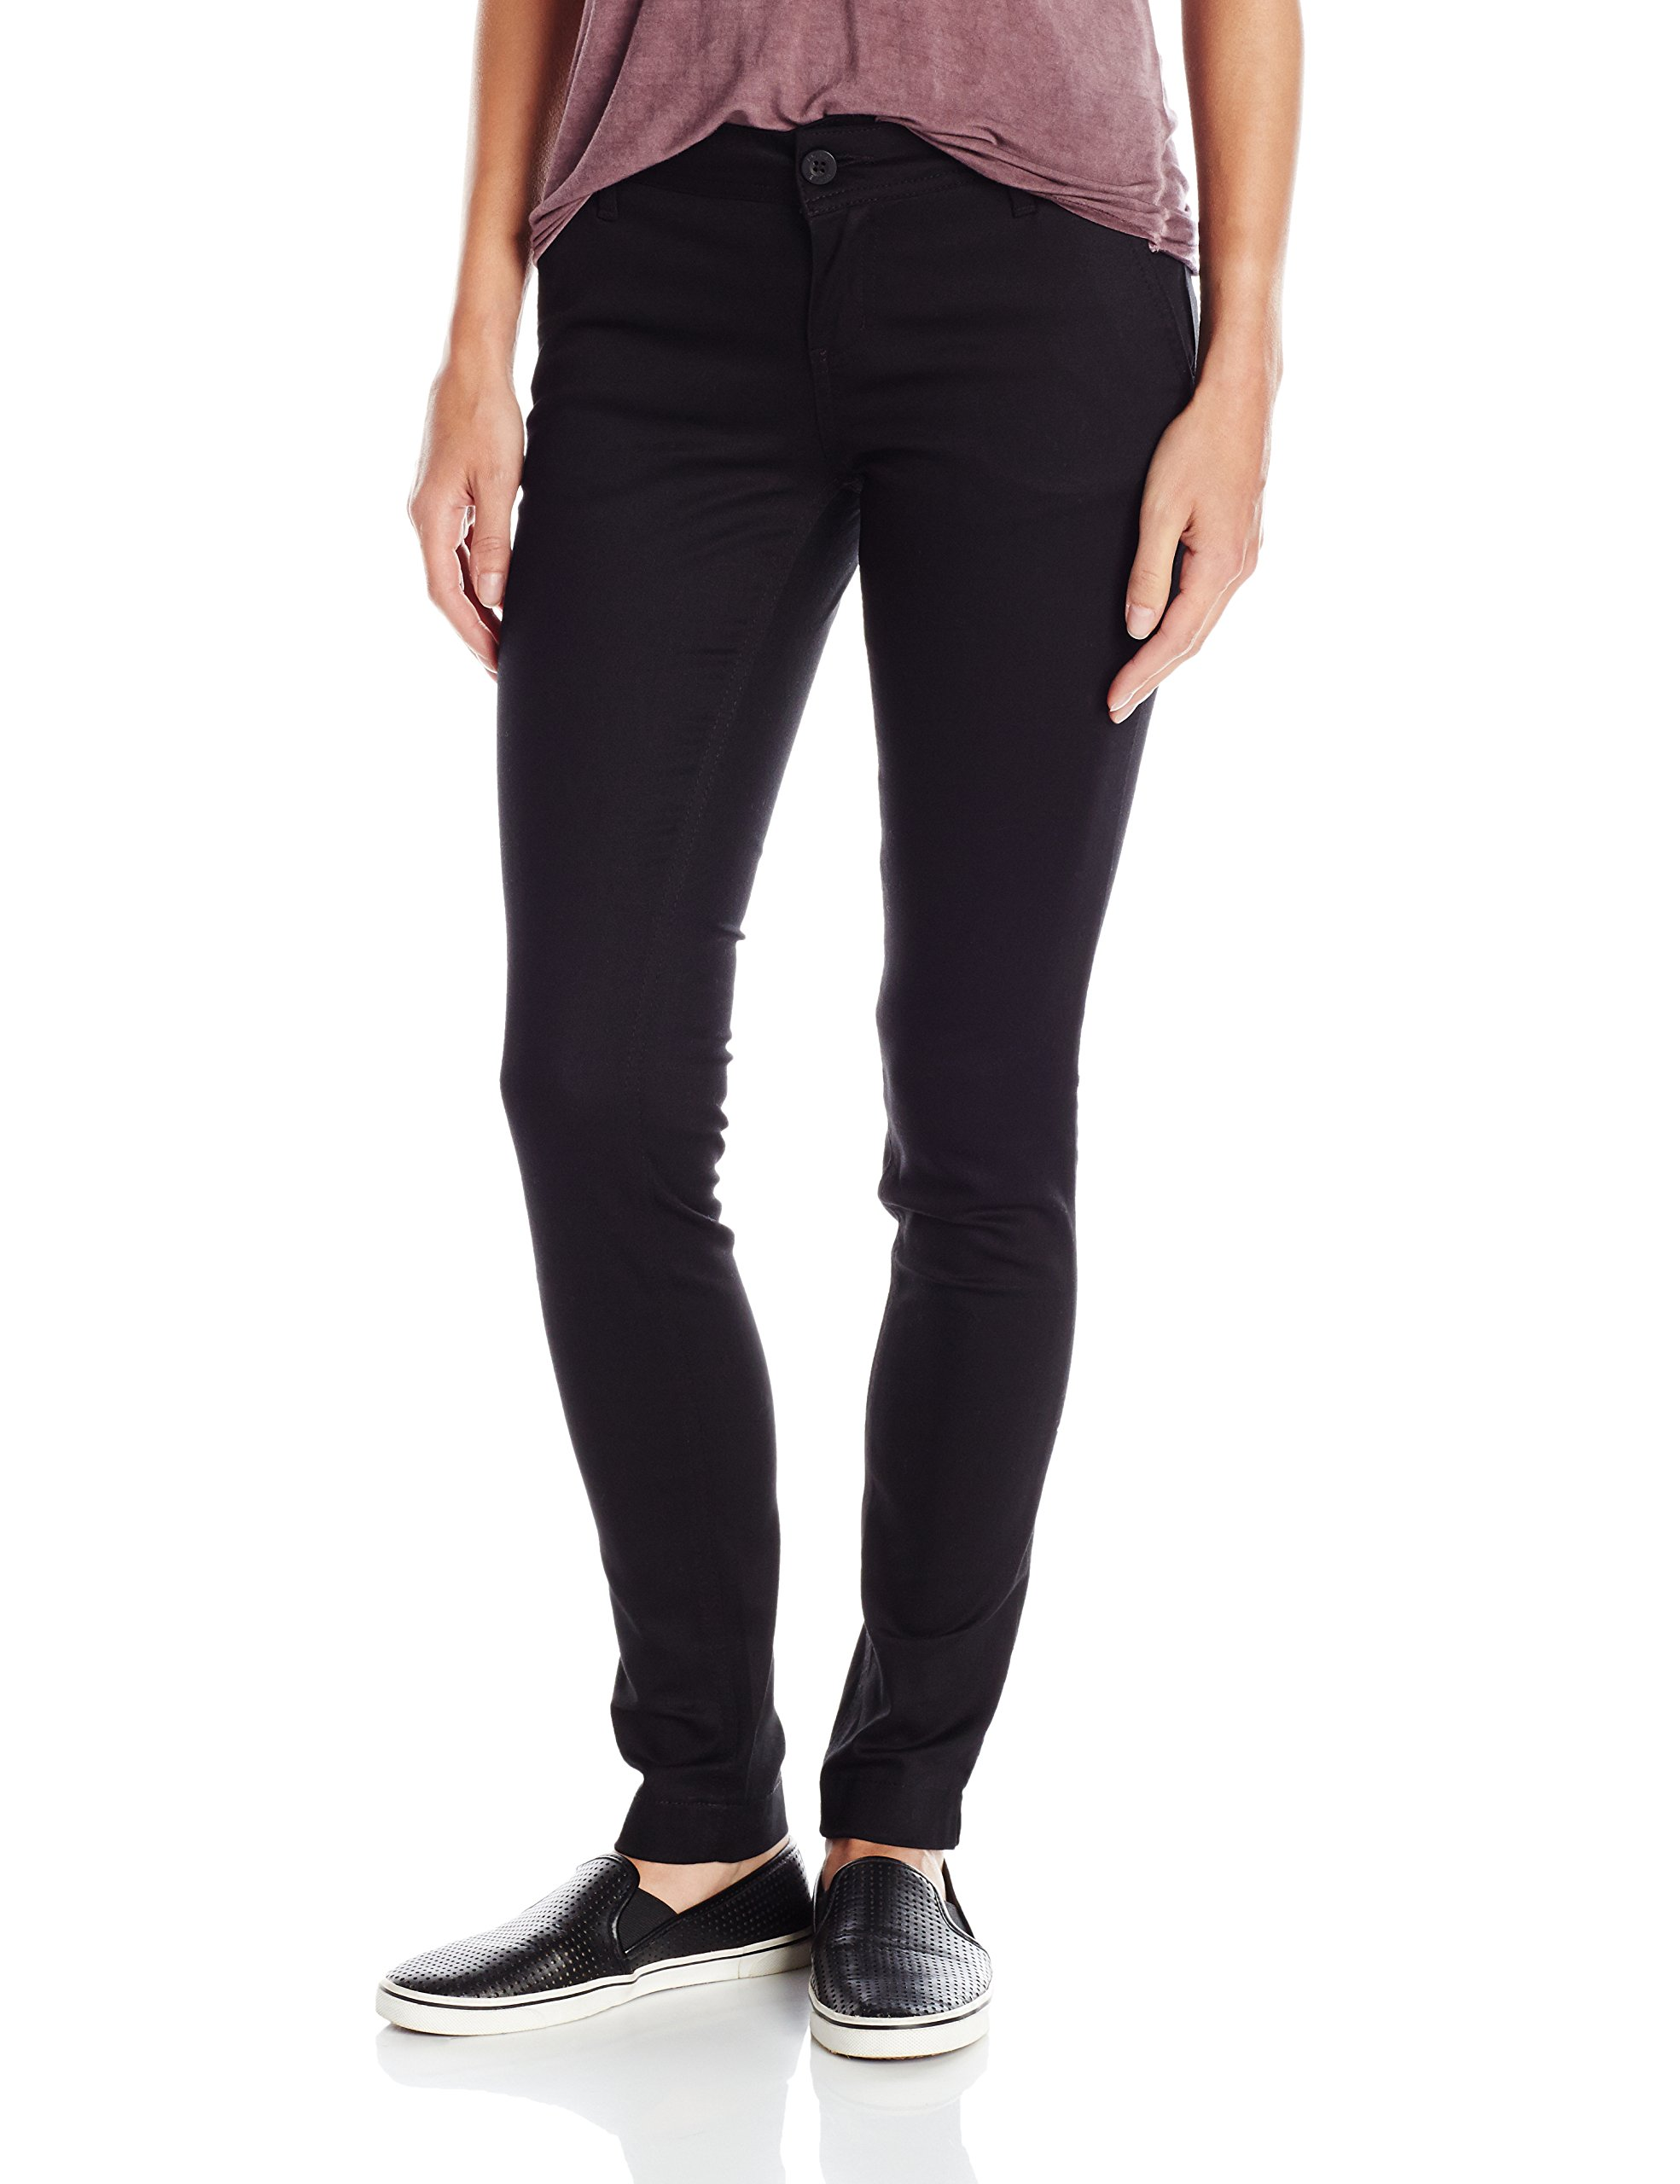 Dickies Girl Juniors 4 Pocket 30'' Inseam Pant, Black, 3 by Dickies Girl